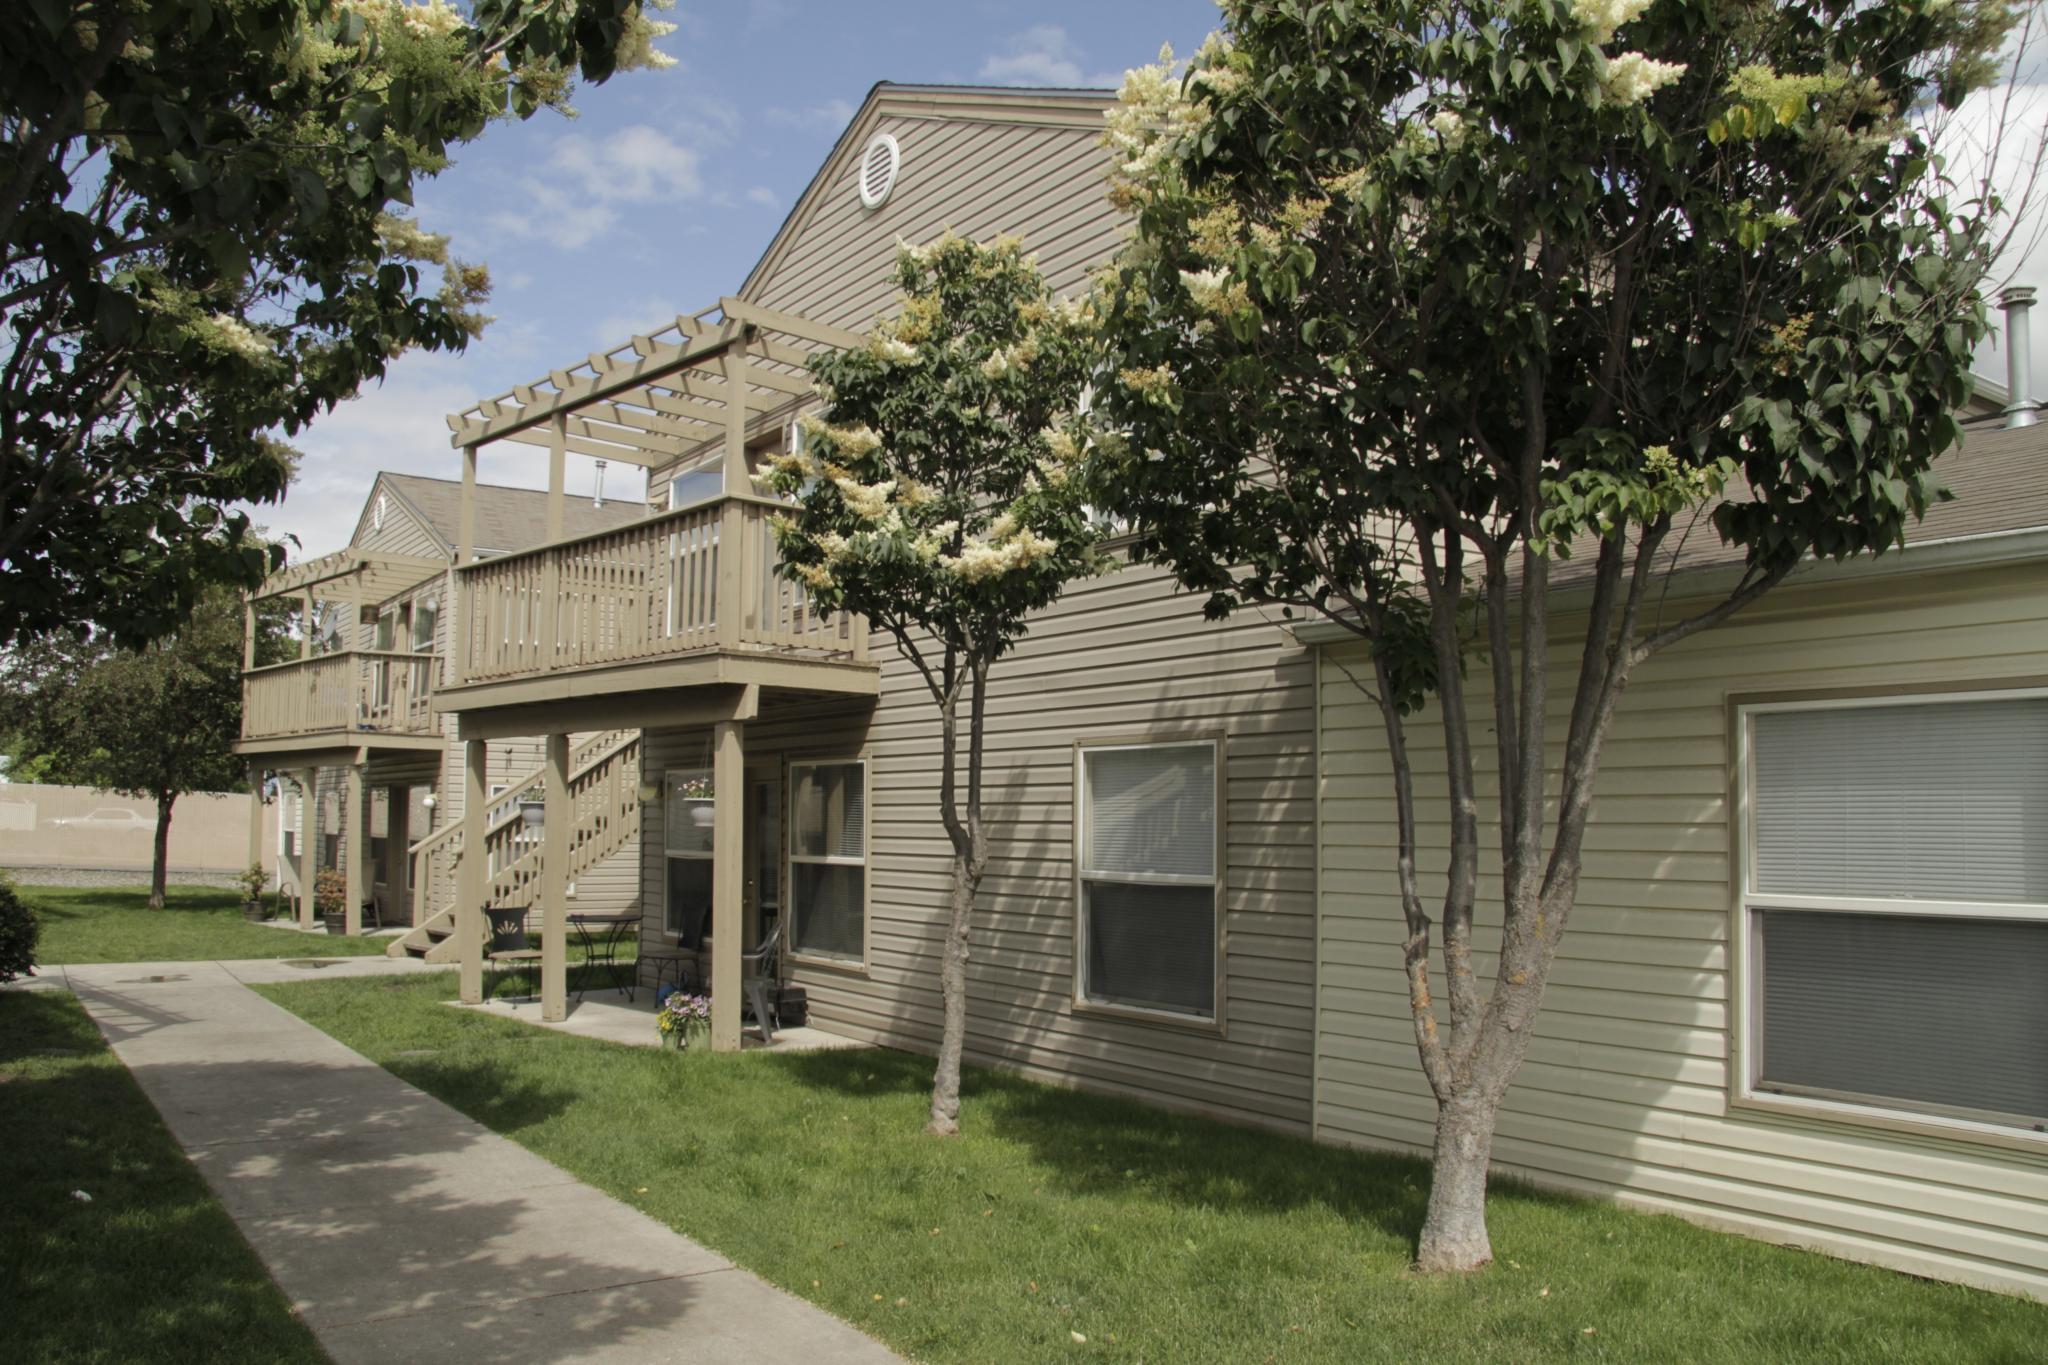 Image of Clarkston Garden Apartments in Clarkston, Washington